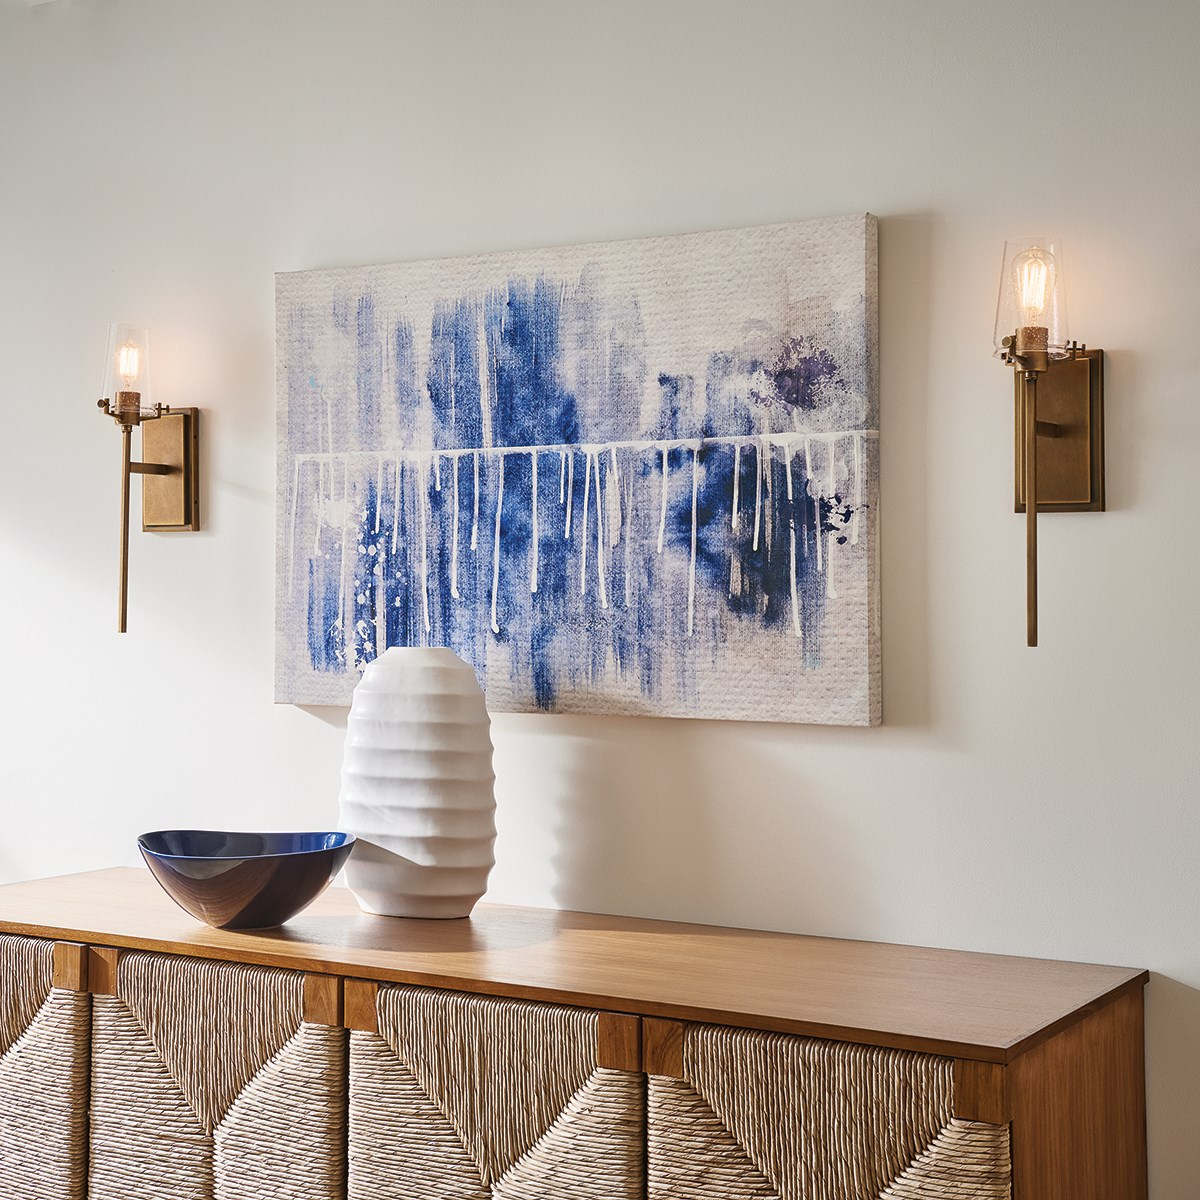 Alton 1 Light Wall Sconce Chrome Kichler Lighting